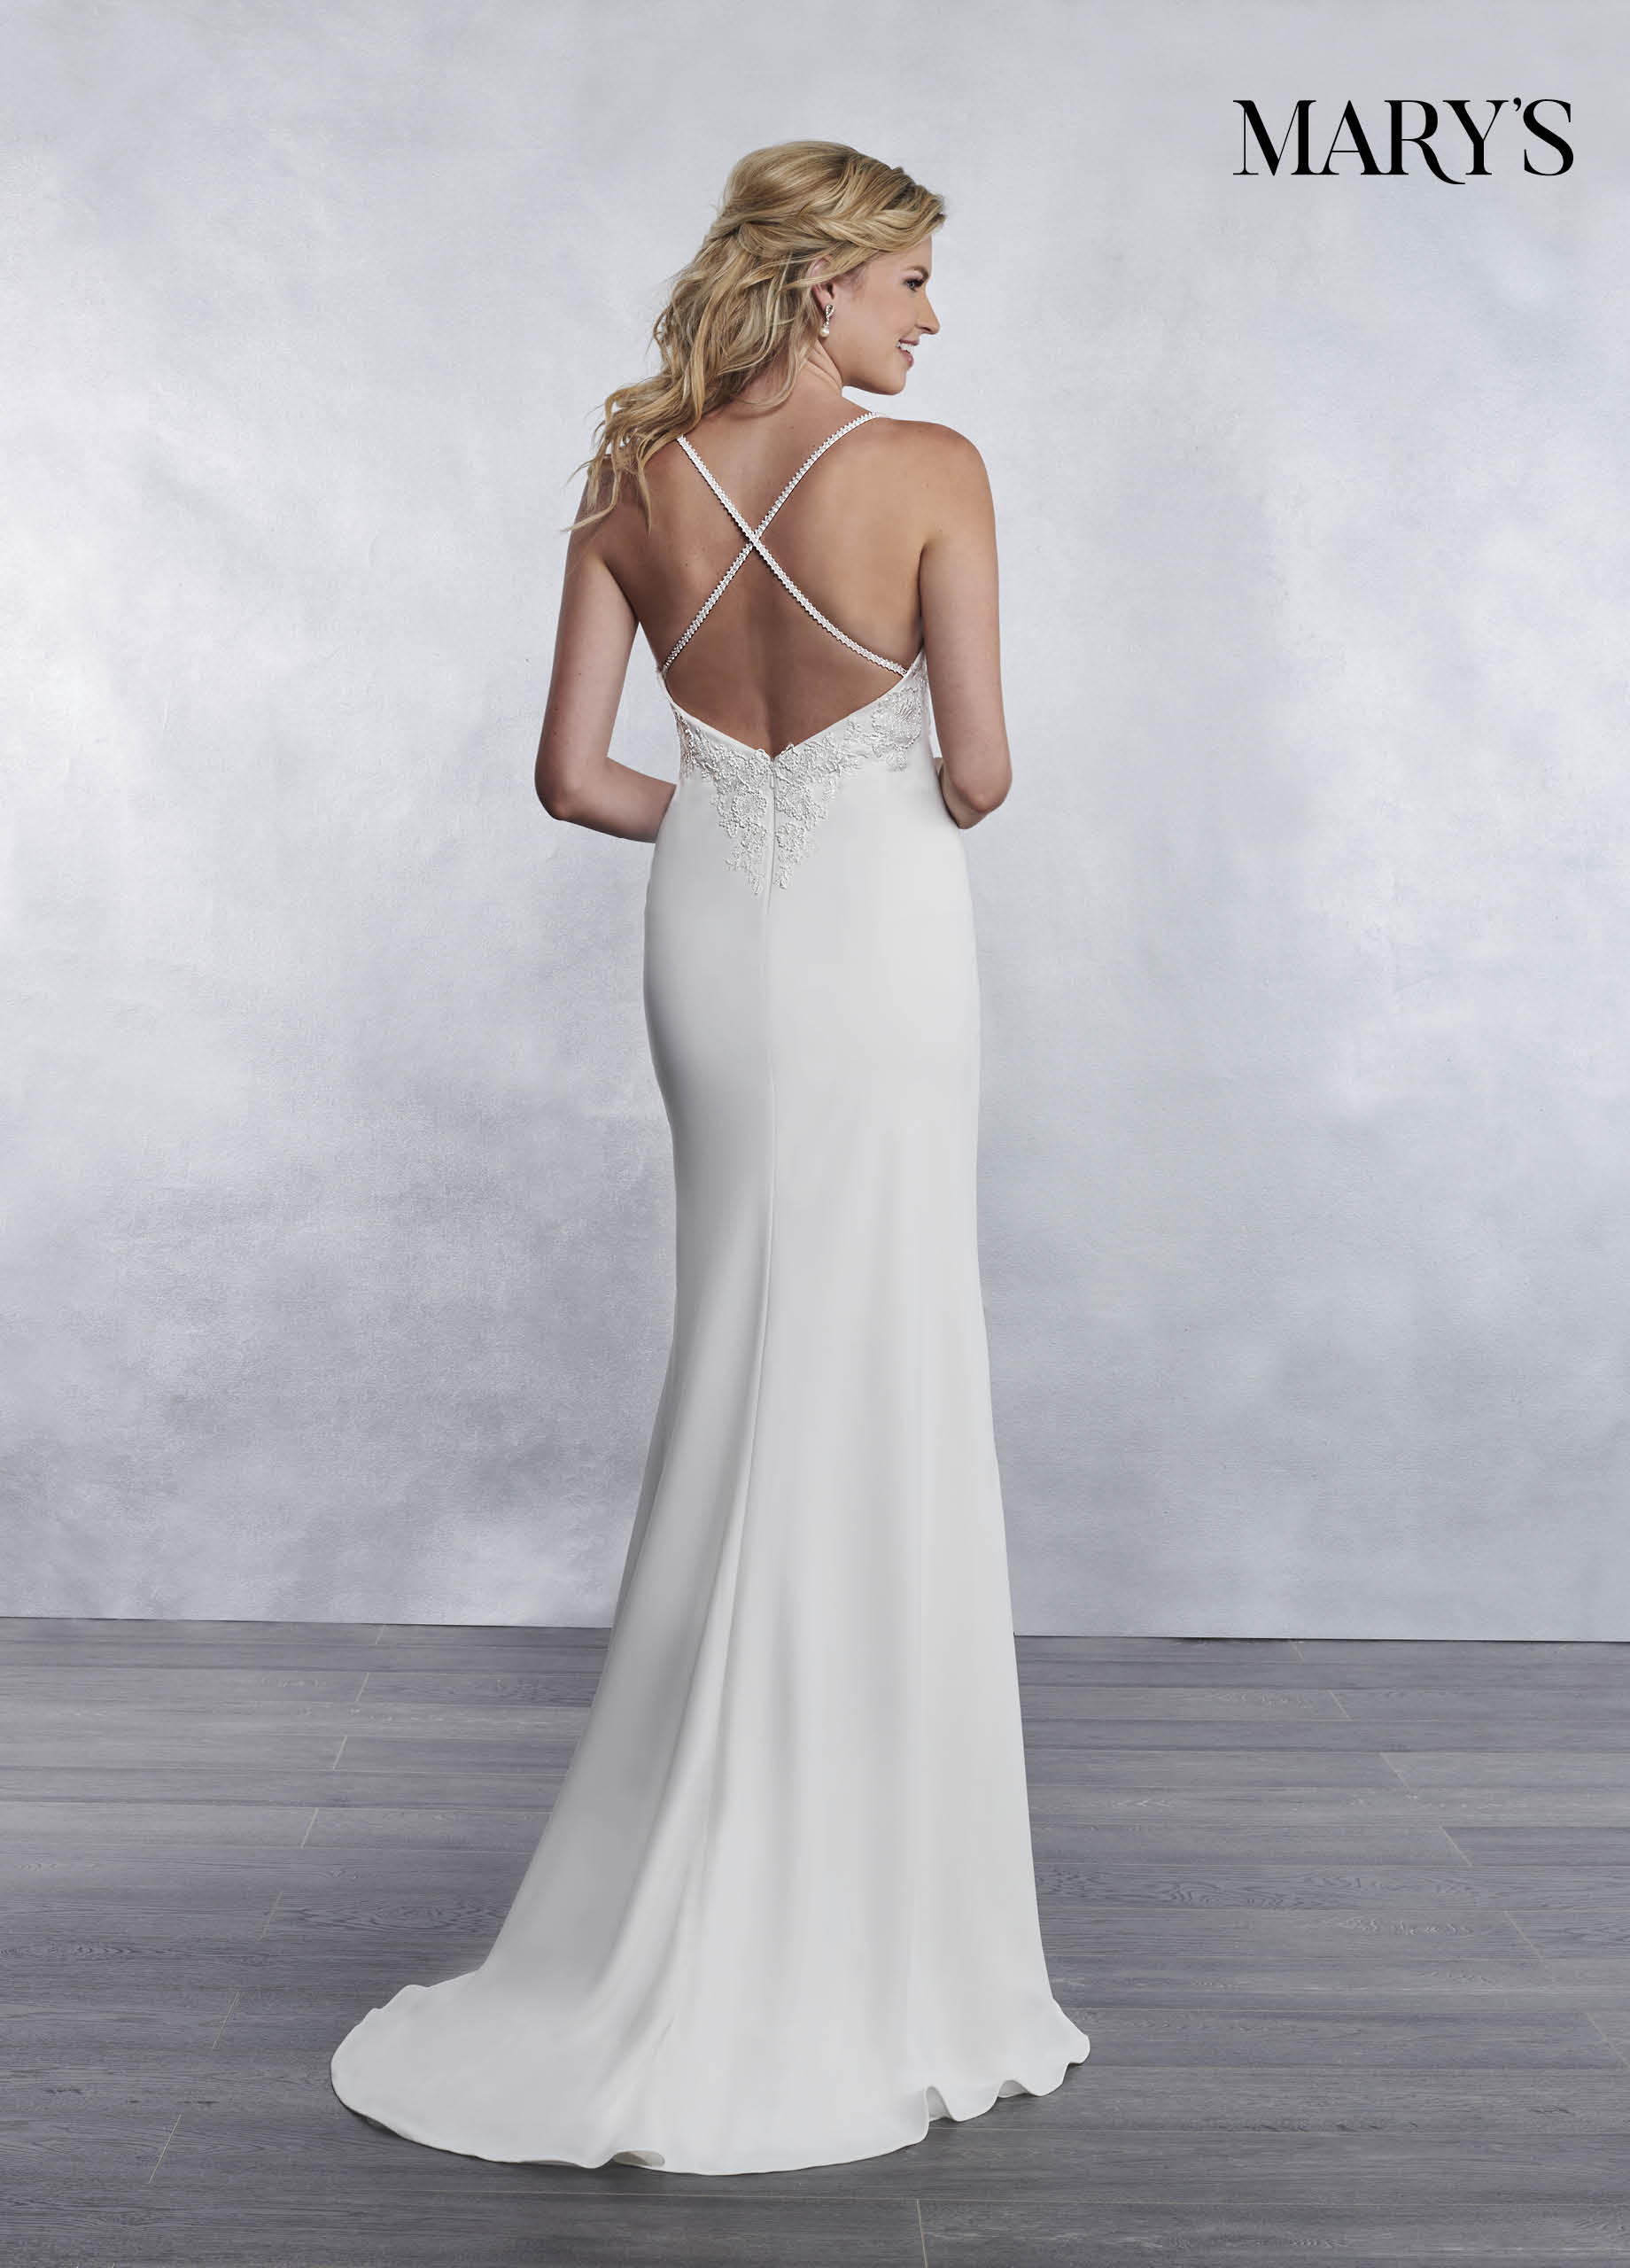 Bridal Wedding Dresses | Mary's | Style - MB1033